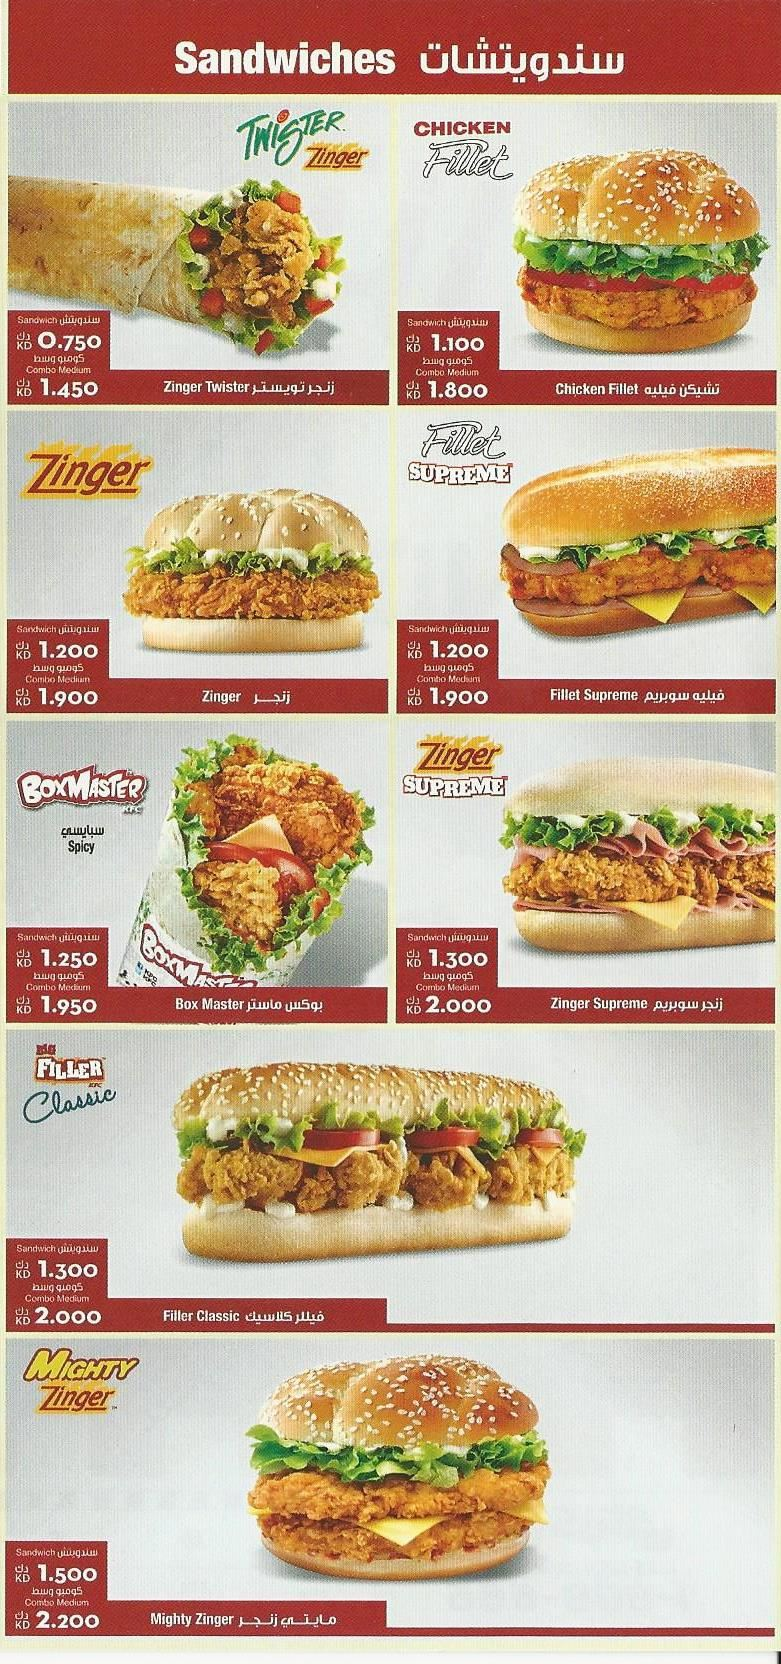 kfc kuwait menu and meals prices :: rinnoo website